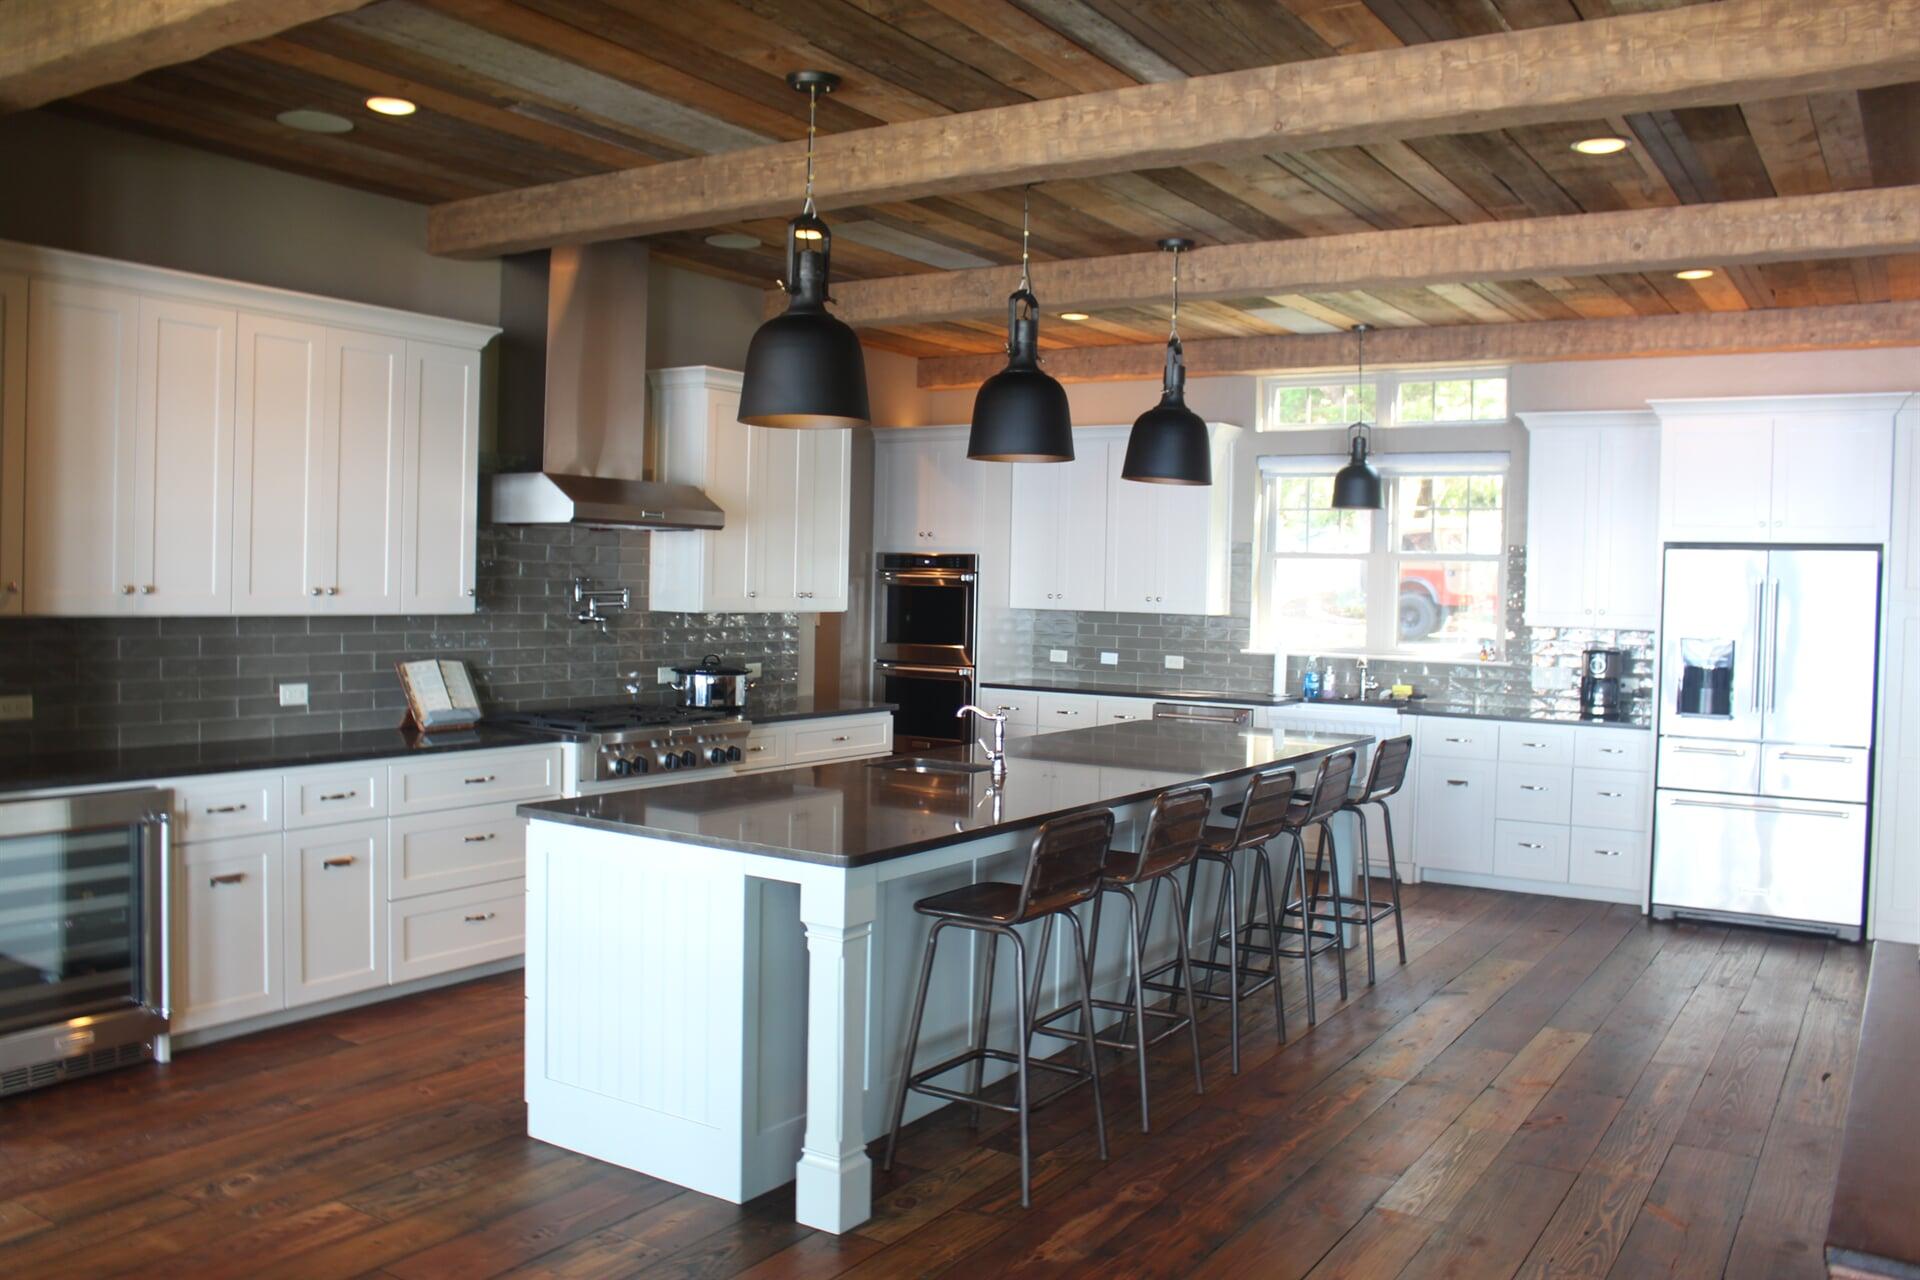 Modern kitchen with dark hardwood floors, white cabinetry, and a gray subway tile backsplash